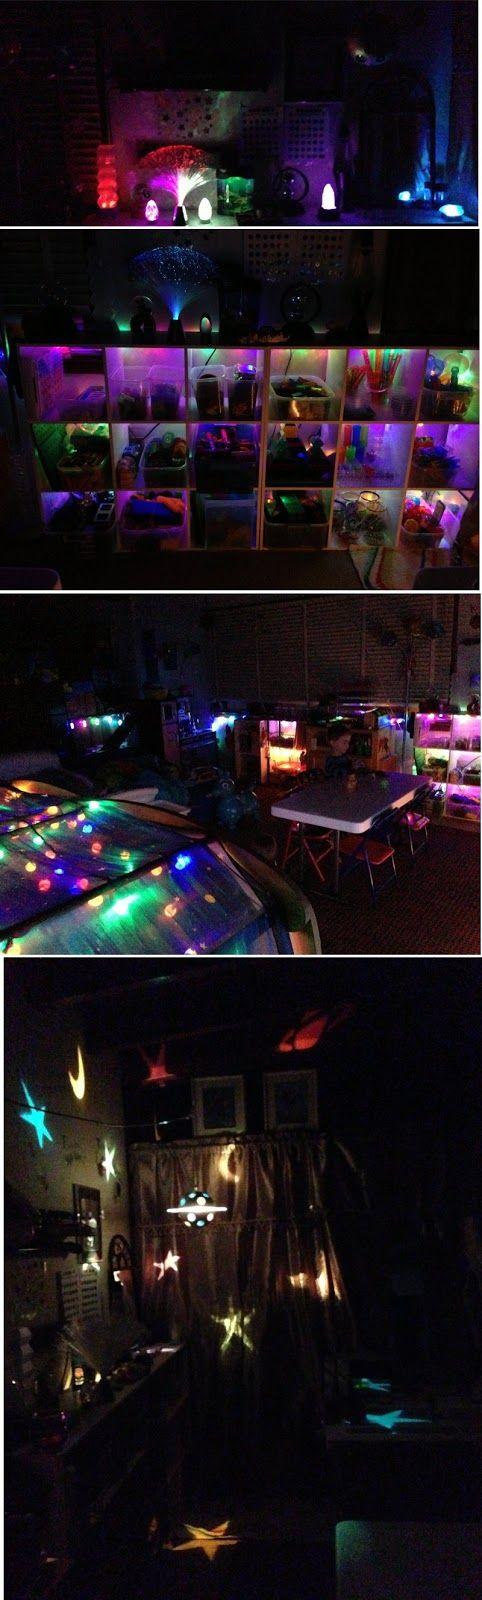 Reggio fridays playroom lighting at night